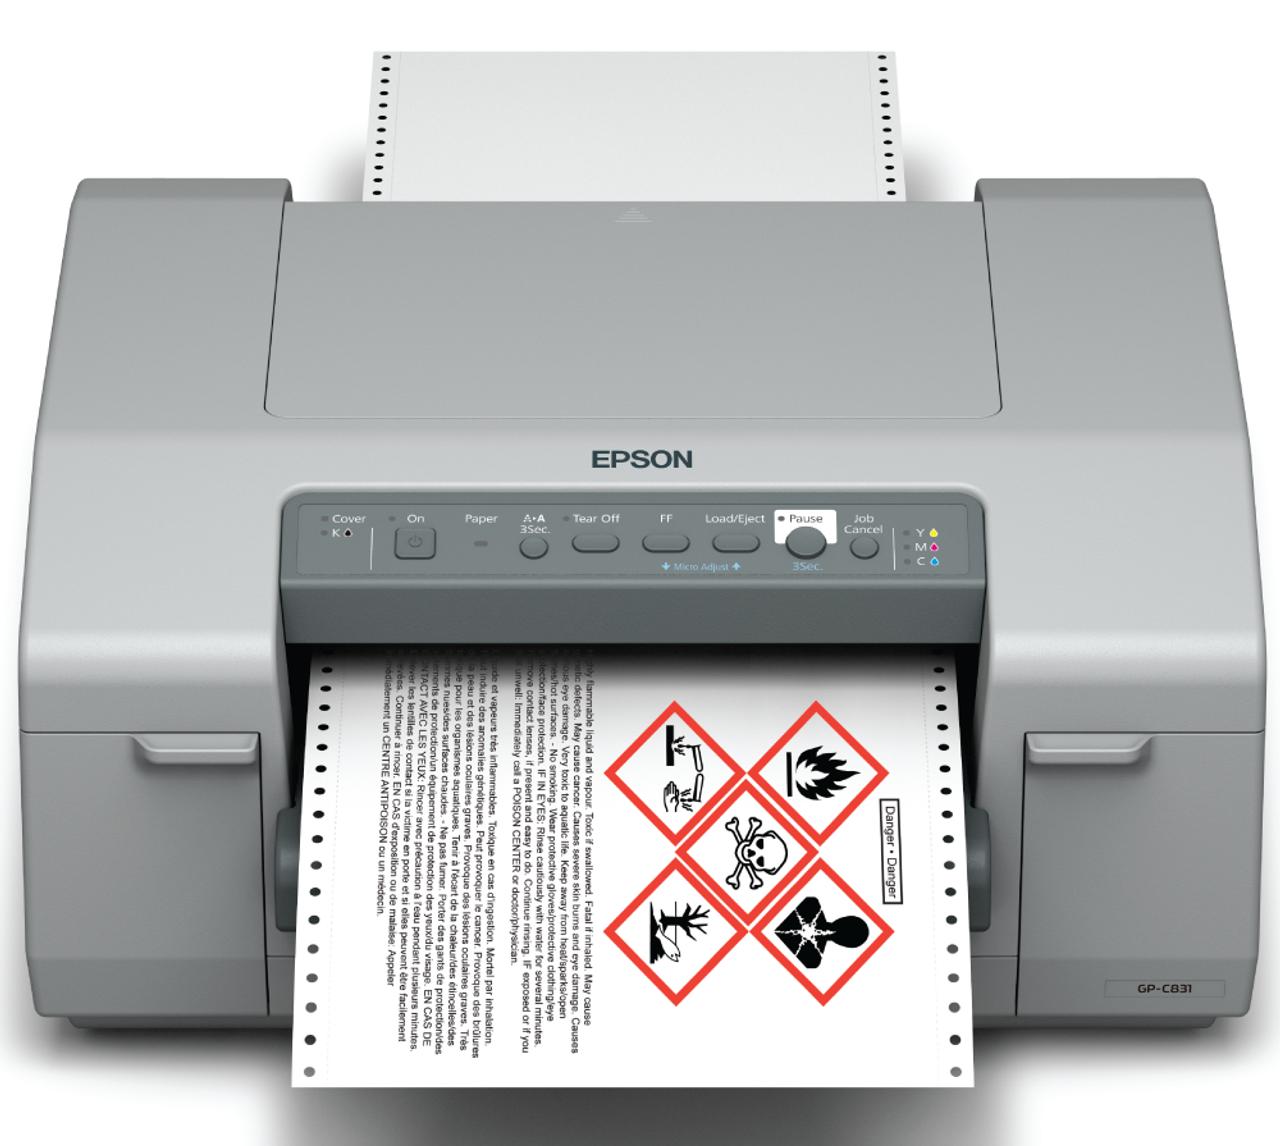 Epson ColorWorks GP C831 Printing A Color GHS Drum Label